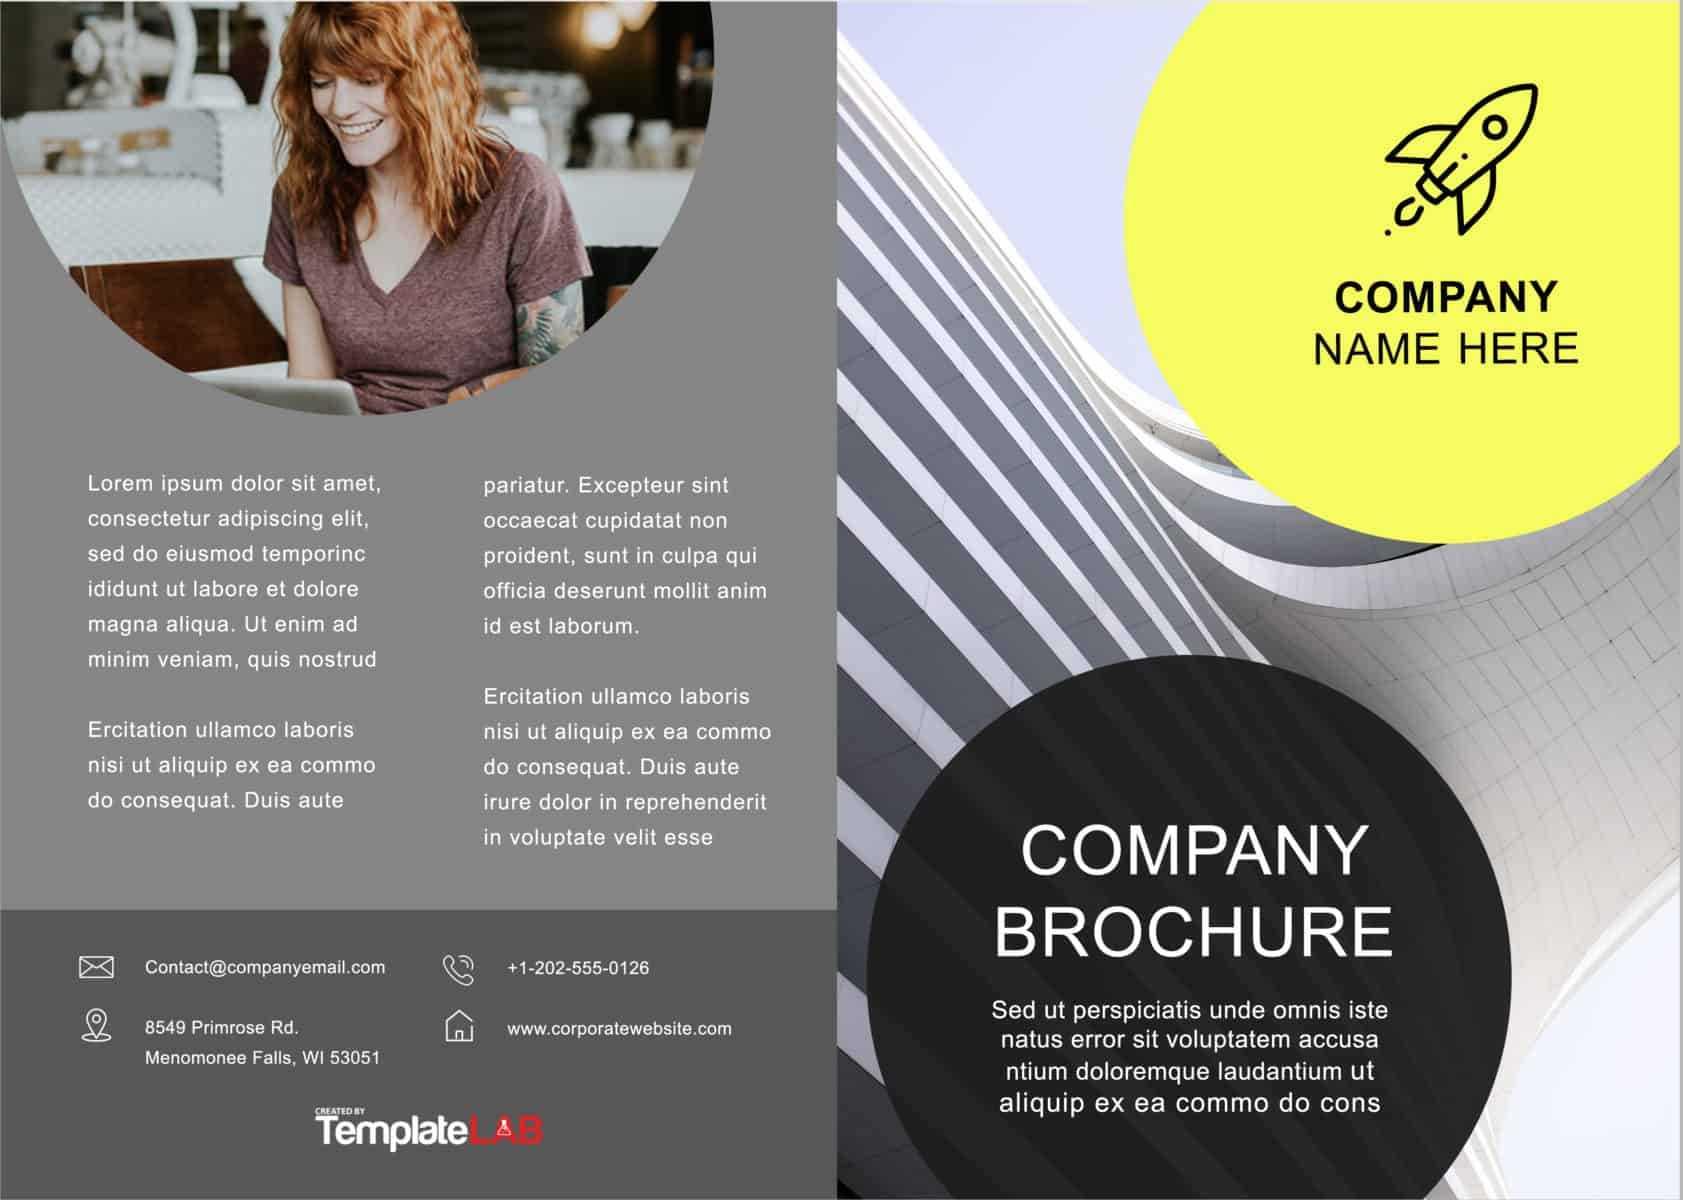 33 Free Brochure Templates (Word + Pdf) ᐅ Template Lab Inside Creative Brochure Templates Free Download